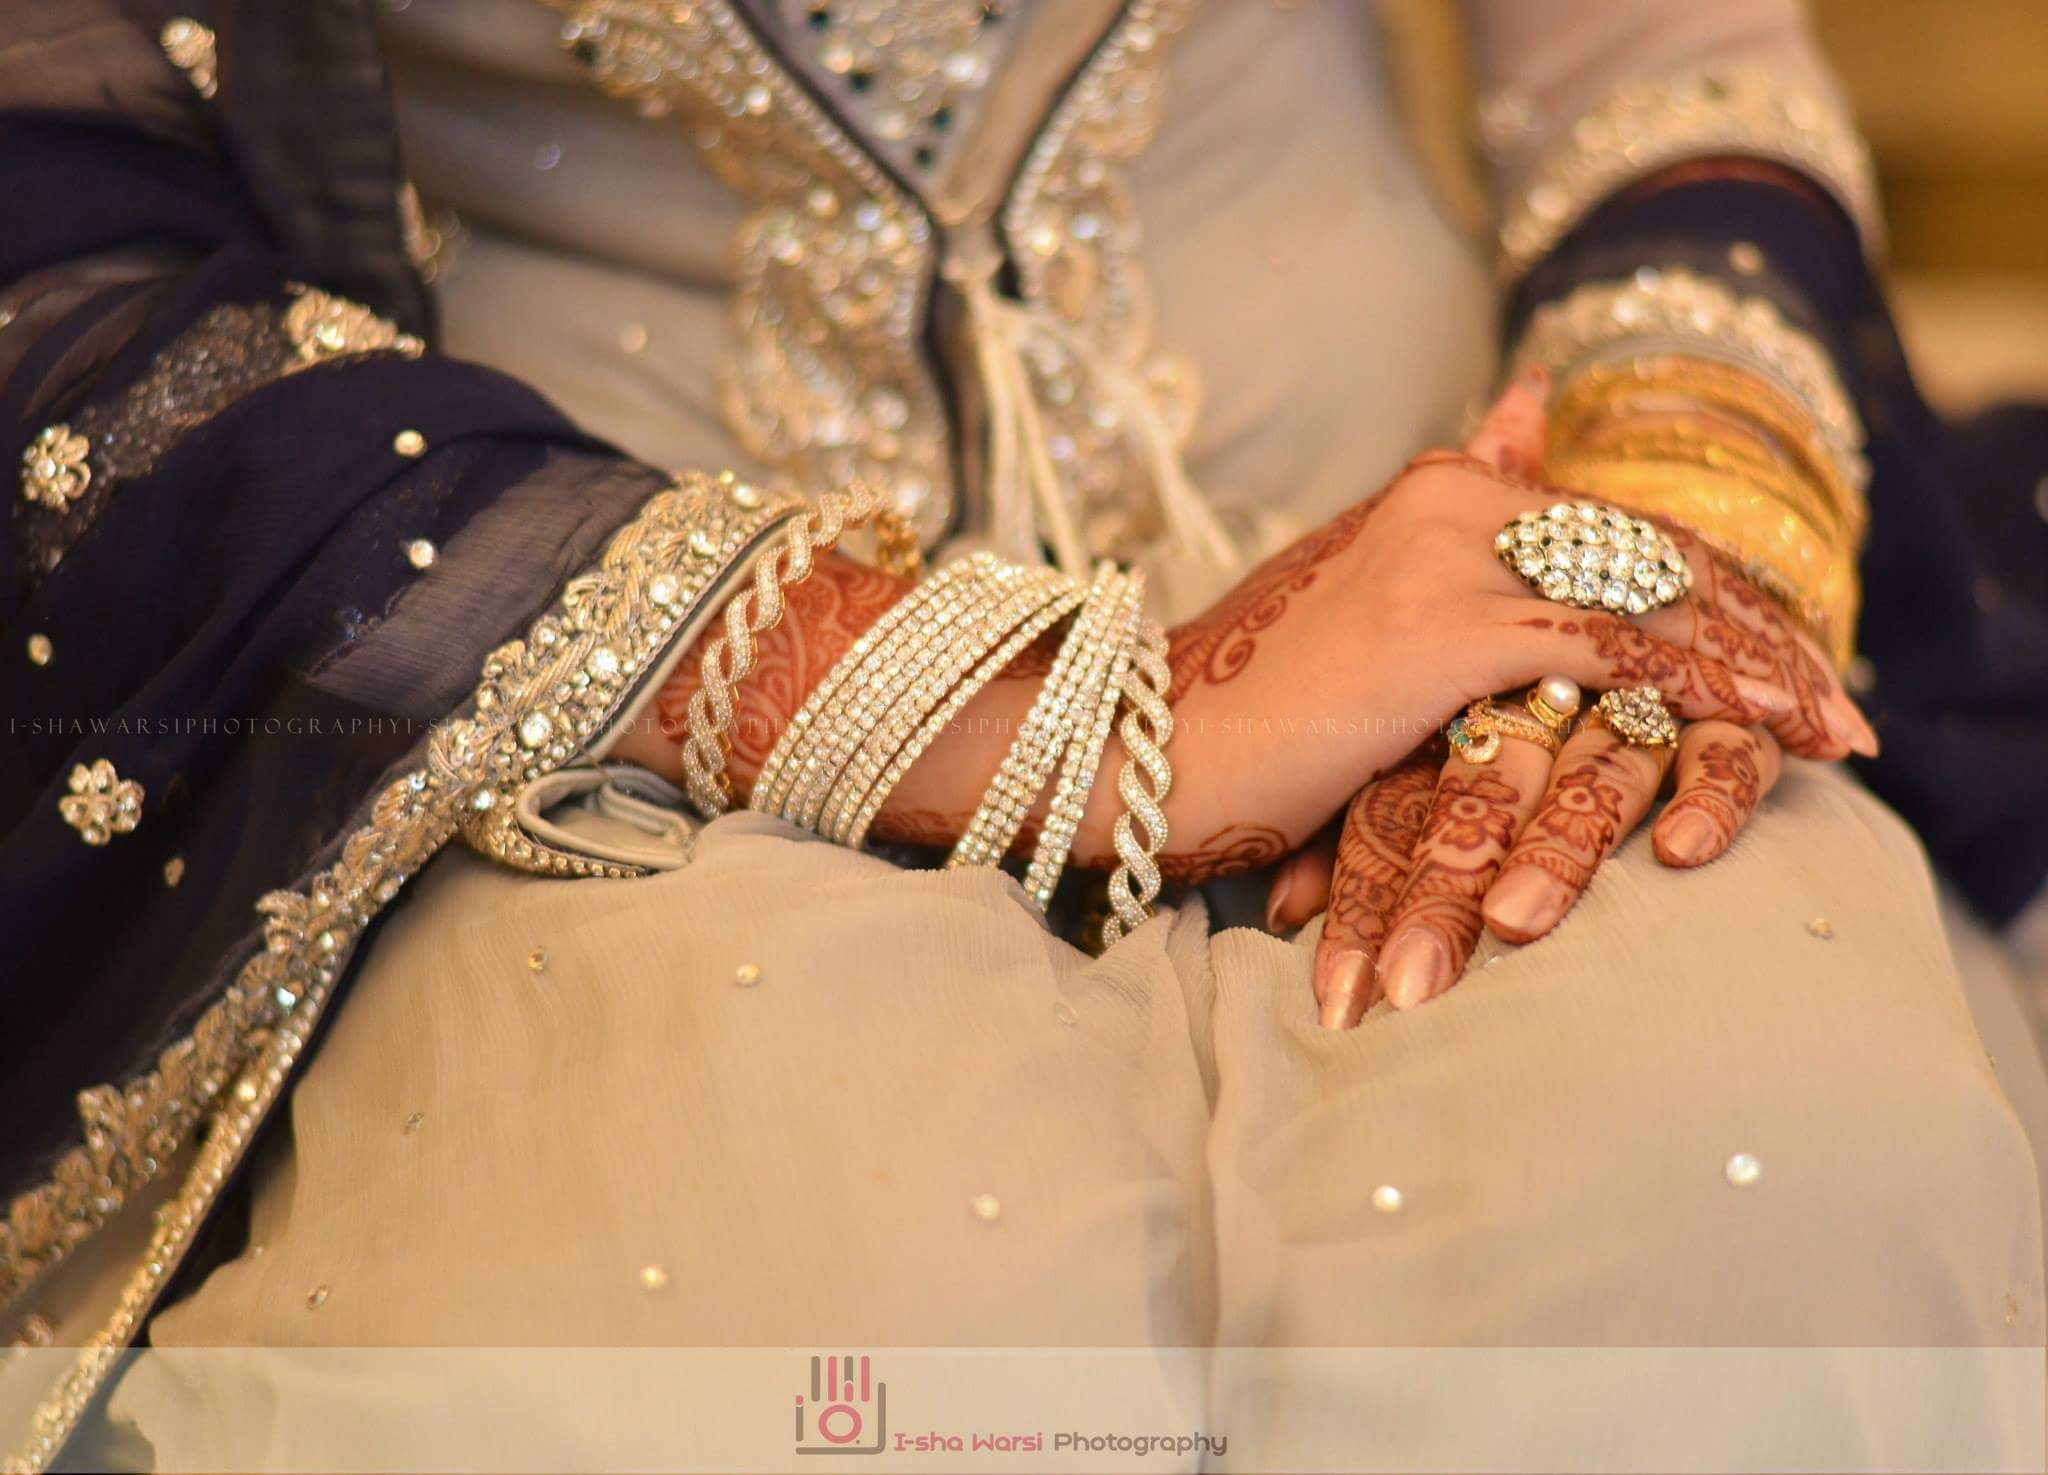 Ishah warsi photography bangles bracelet chora kara